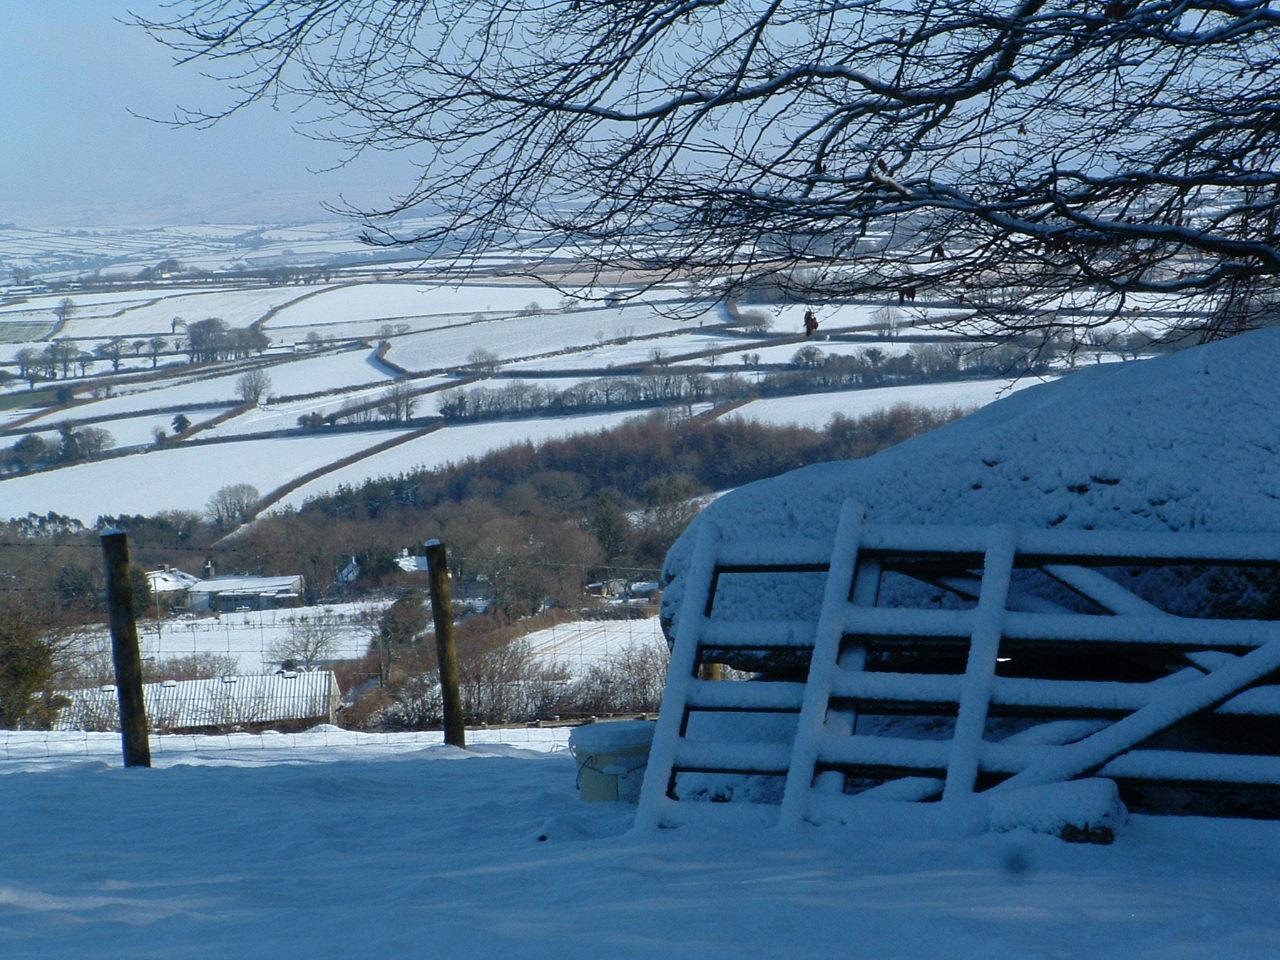 Winter at the Farm!